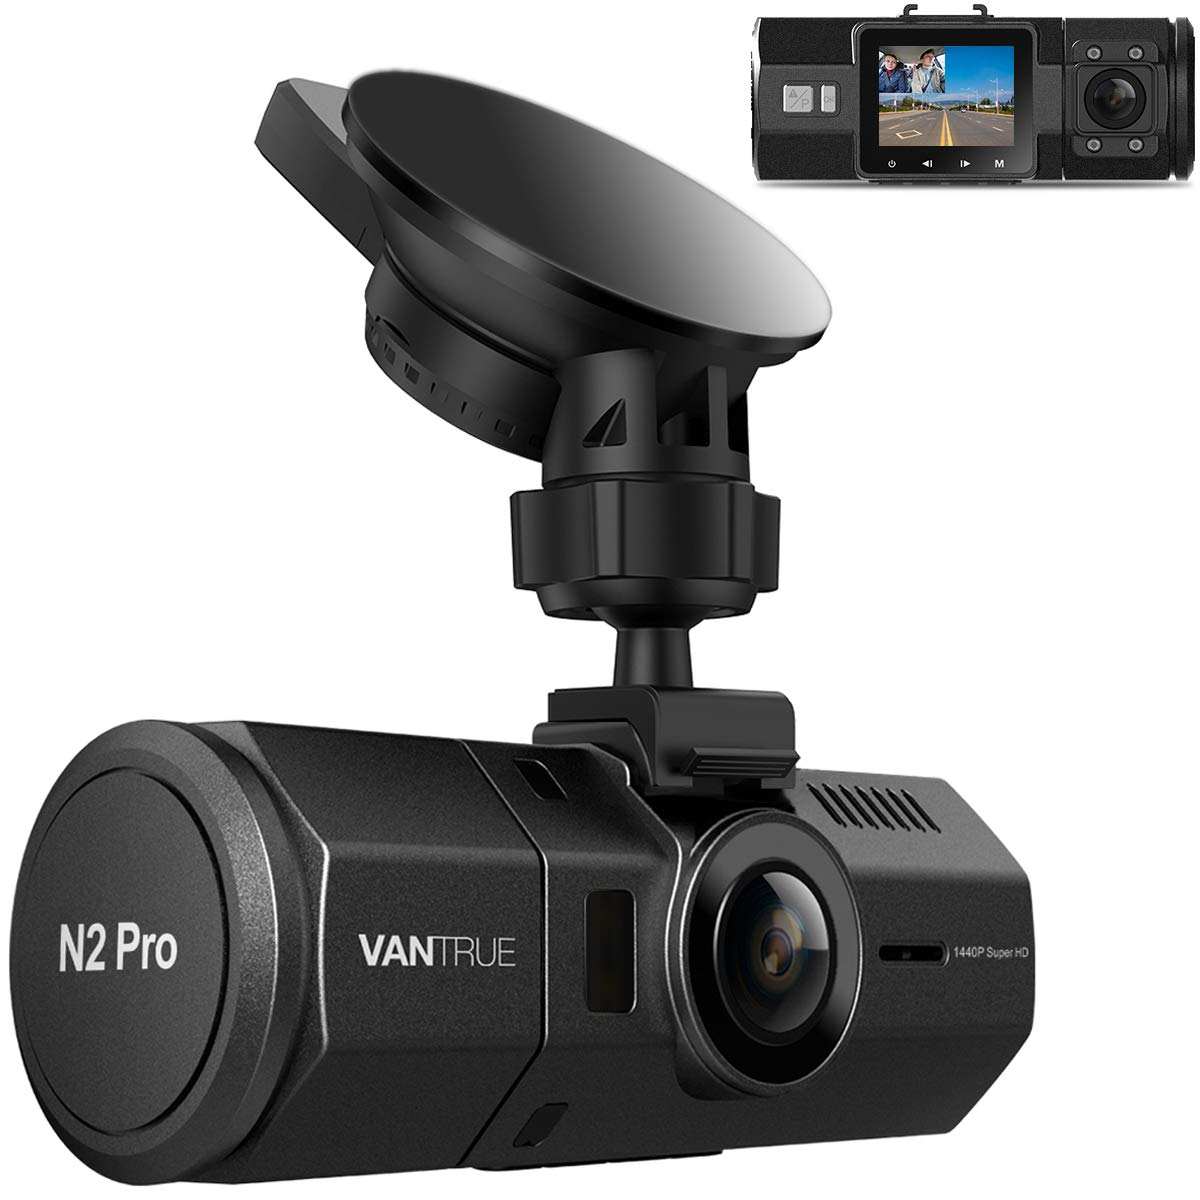 Vantrue N2 Pro Uber Dual Dash Cam Dual 1920x1080P Infrared Night Vision Front and Inside Dash Camera, 2.5K 2560x1440P Single Front, 310° Car Camera, 24hr Parking Mode, Motion Sensor, Support 256GB max by VANTRUE